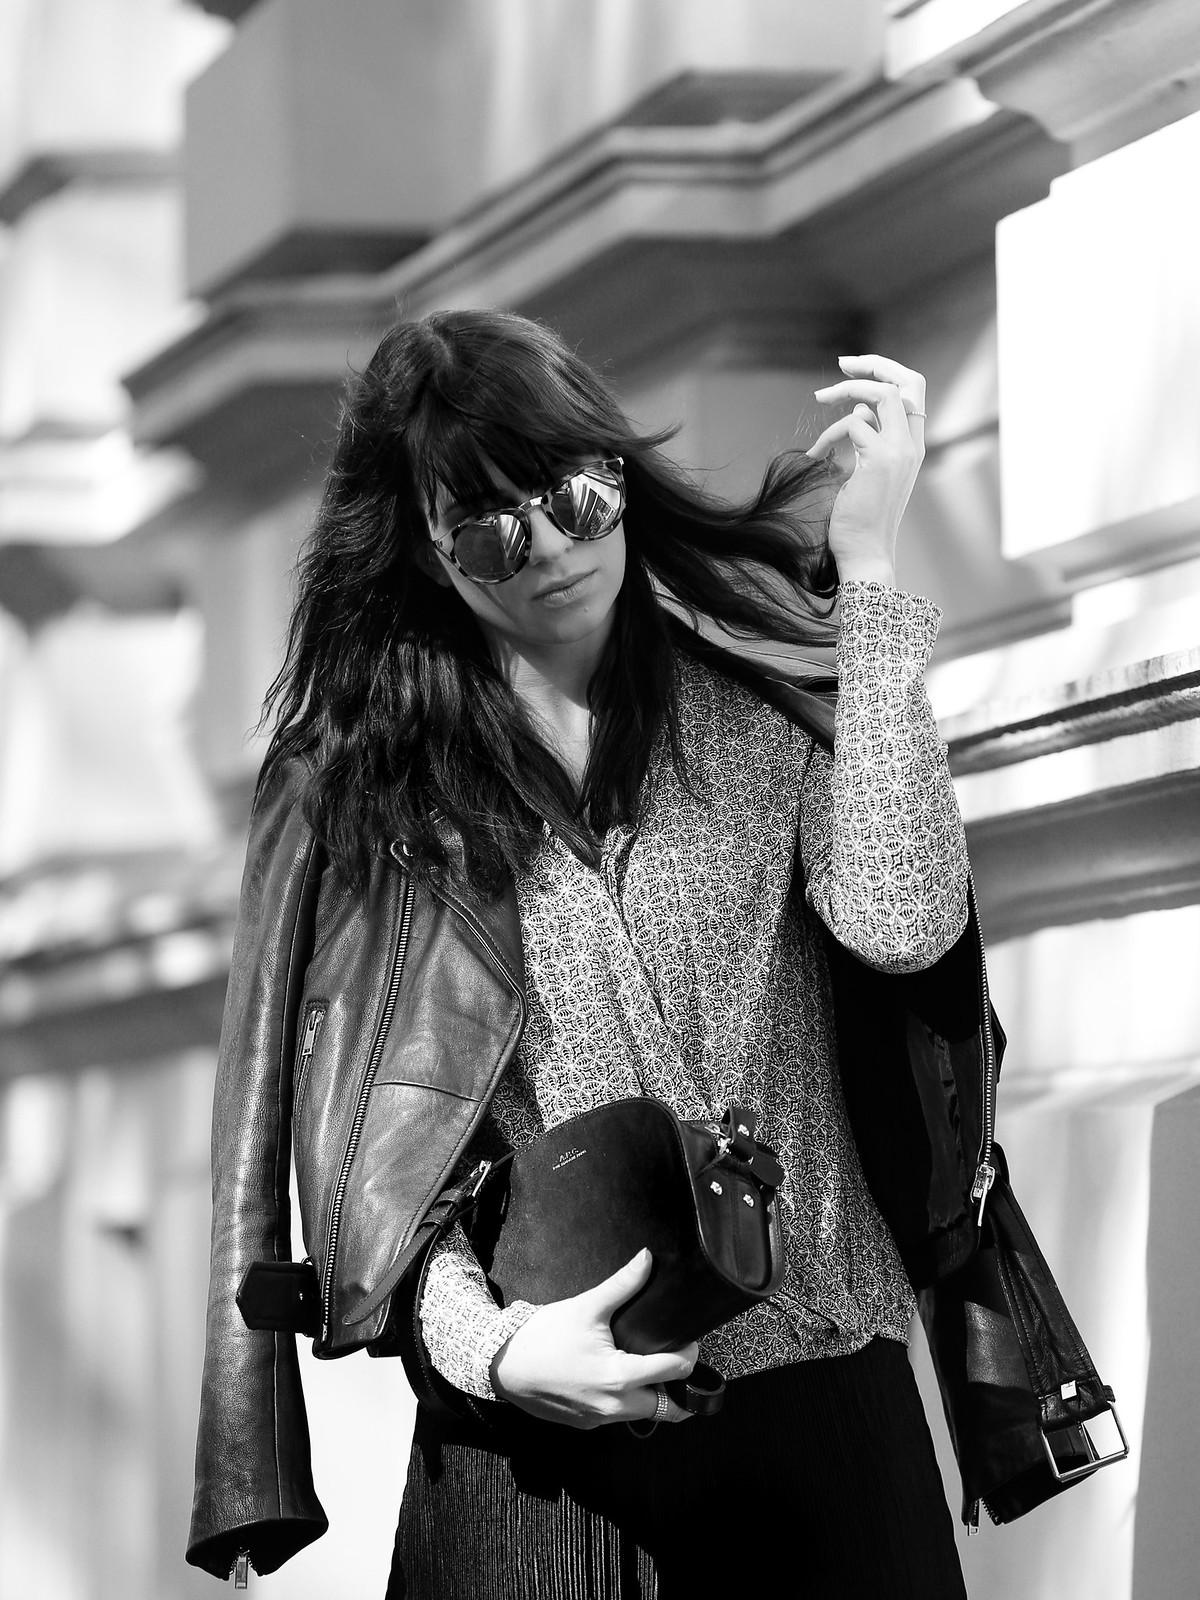 outfit ootd promod bluse herbst blouse shirt pattern muster lederjacke zara sonnenbrille sonne licht schatten cats & dogs fashion blog ricarda schernus modeblogger berlin blogger düsseldorf 6